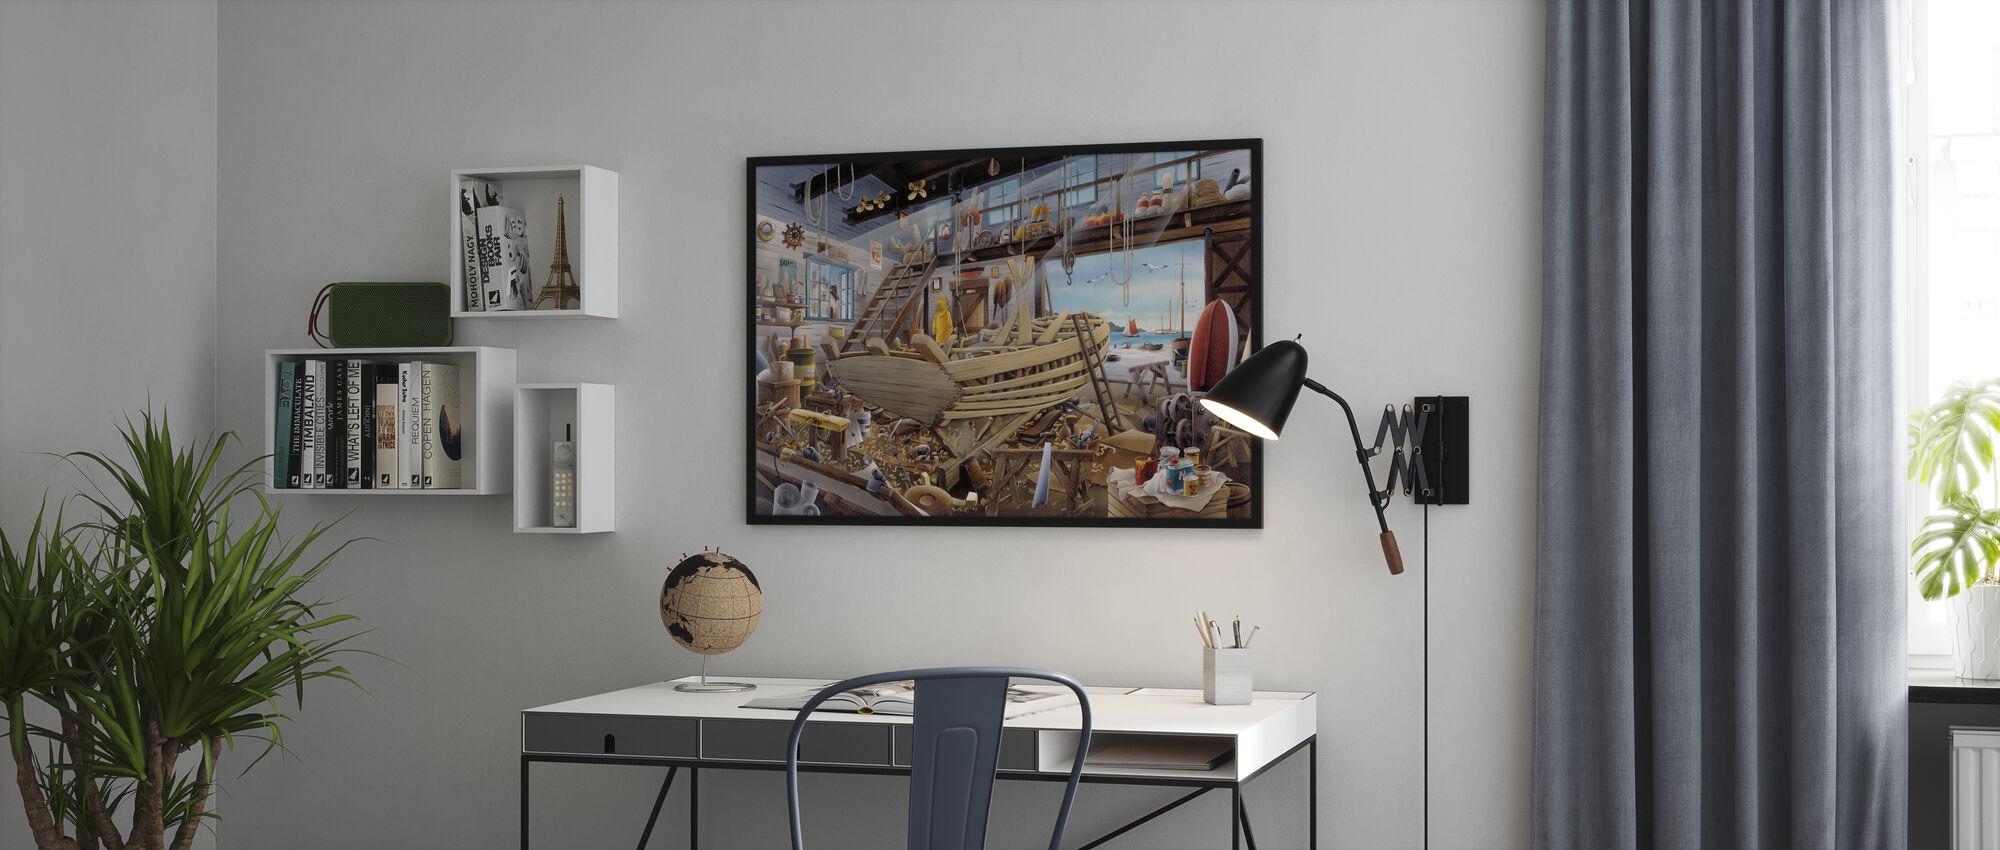 Bootshof - Poster - Büro